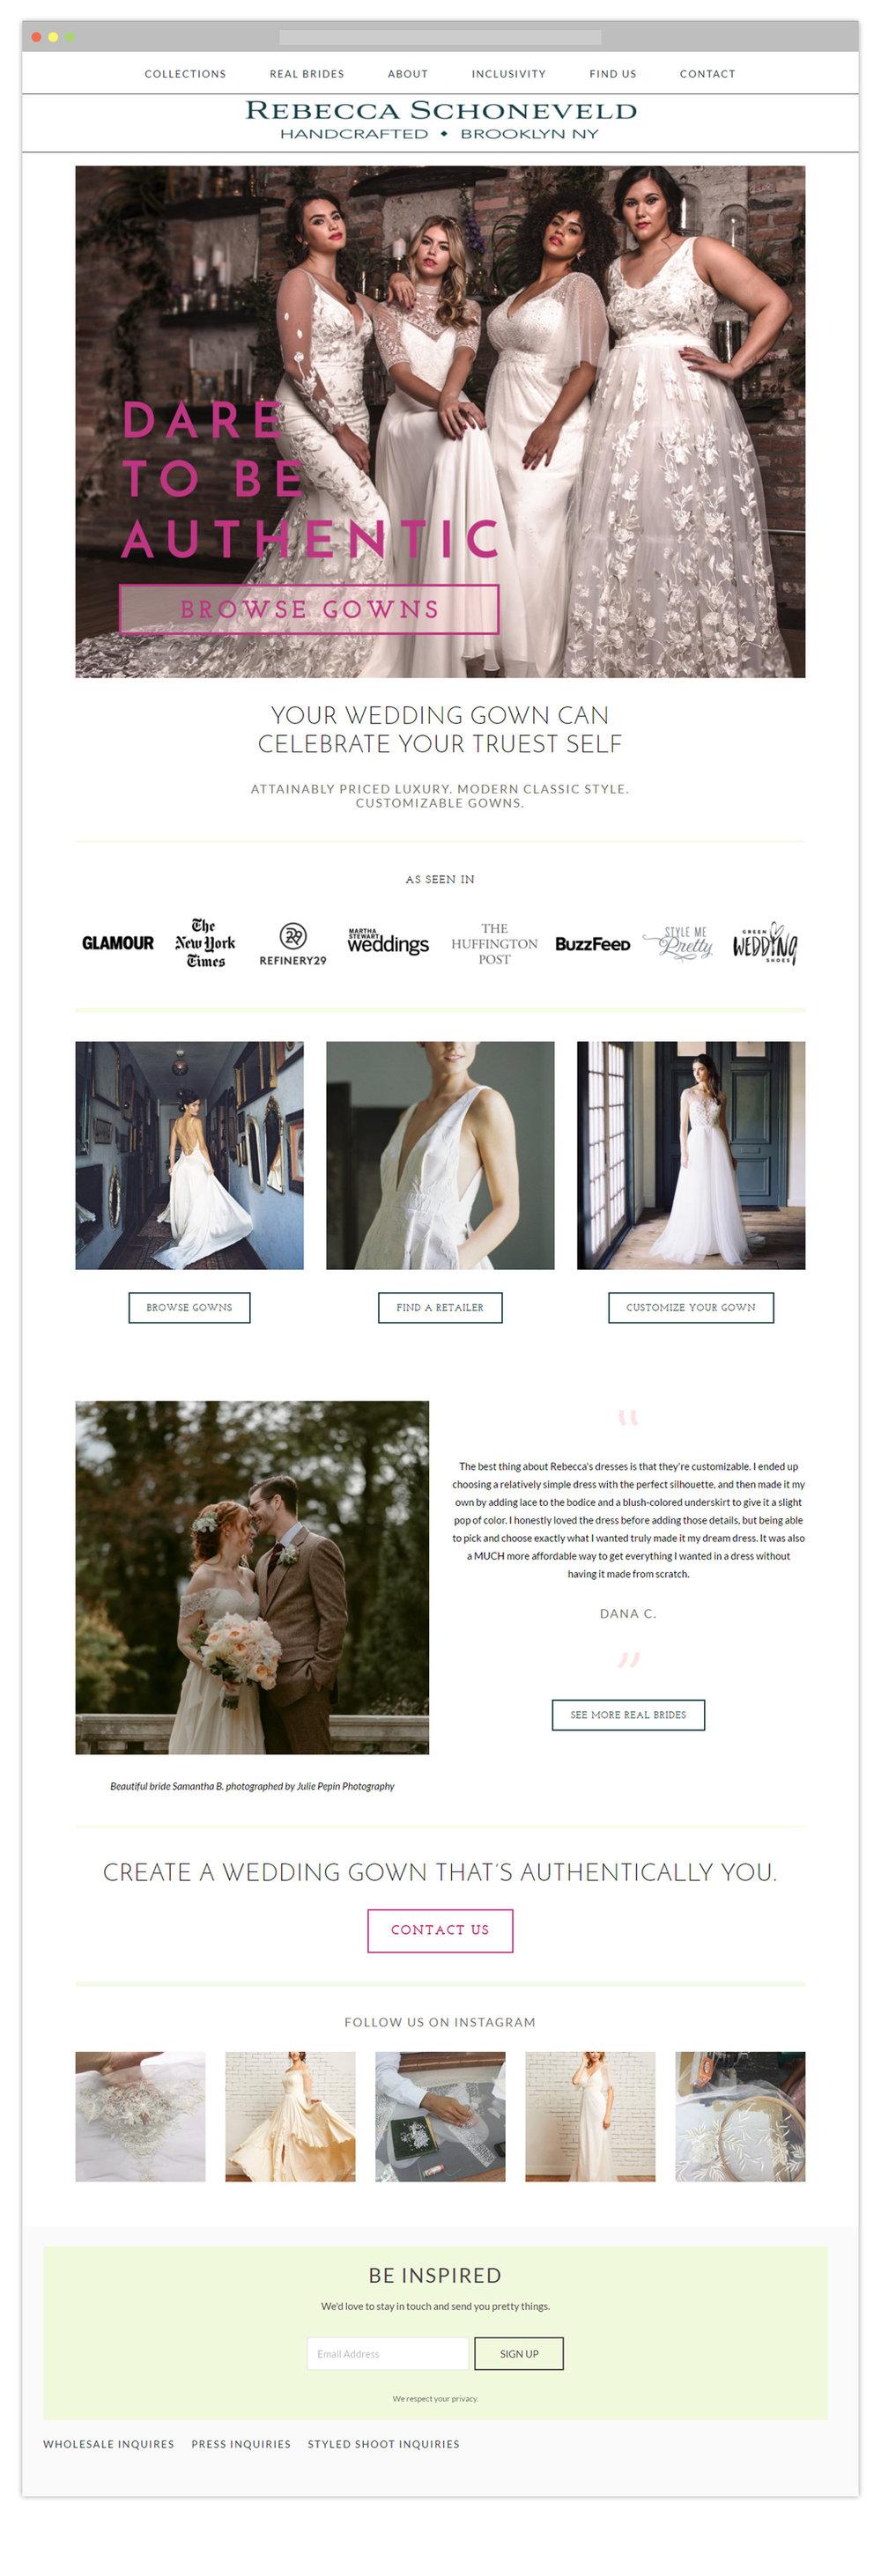 home-page-redesign-rebecca-schoneveld.jpg